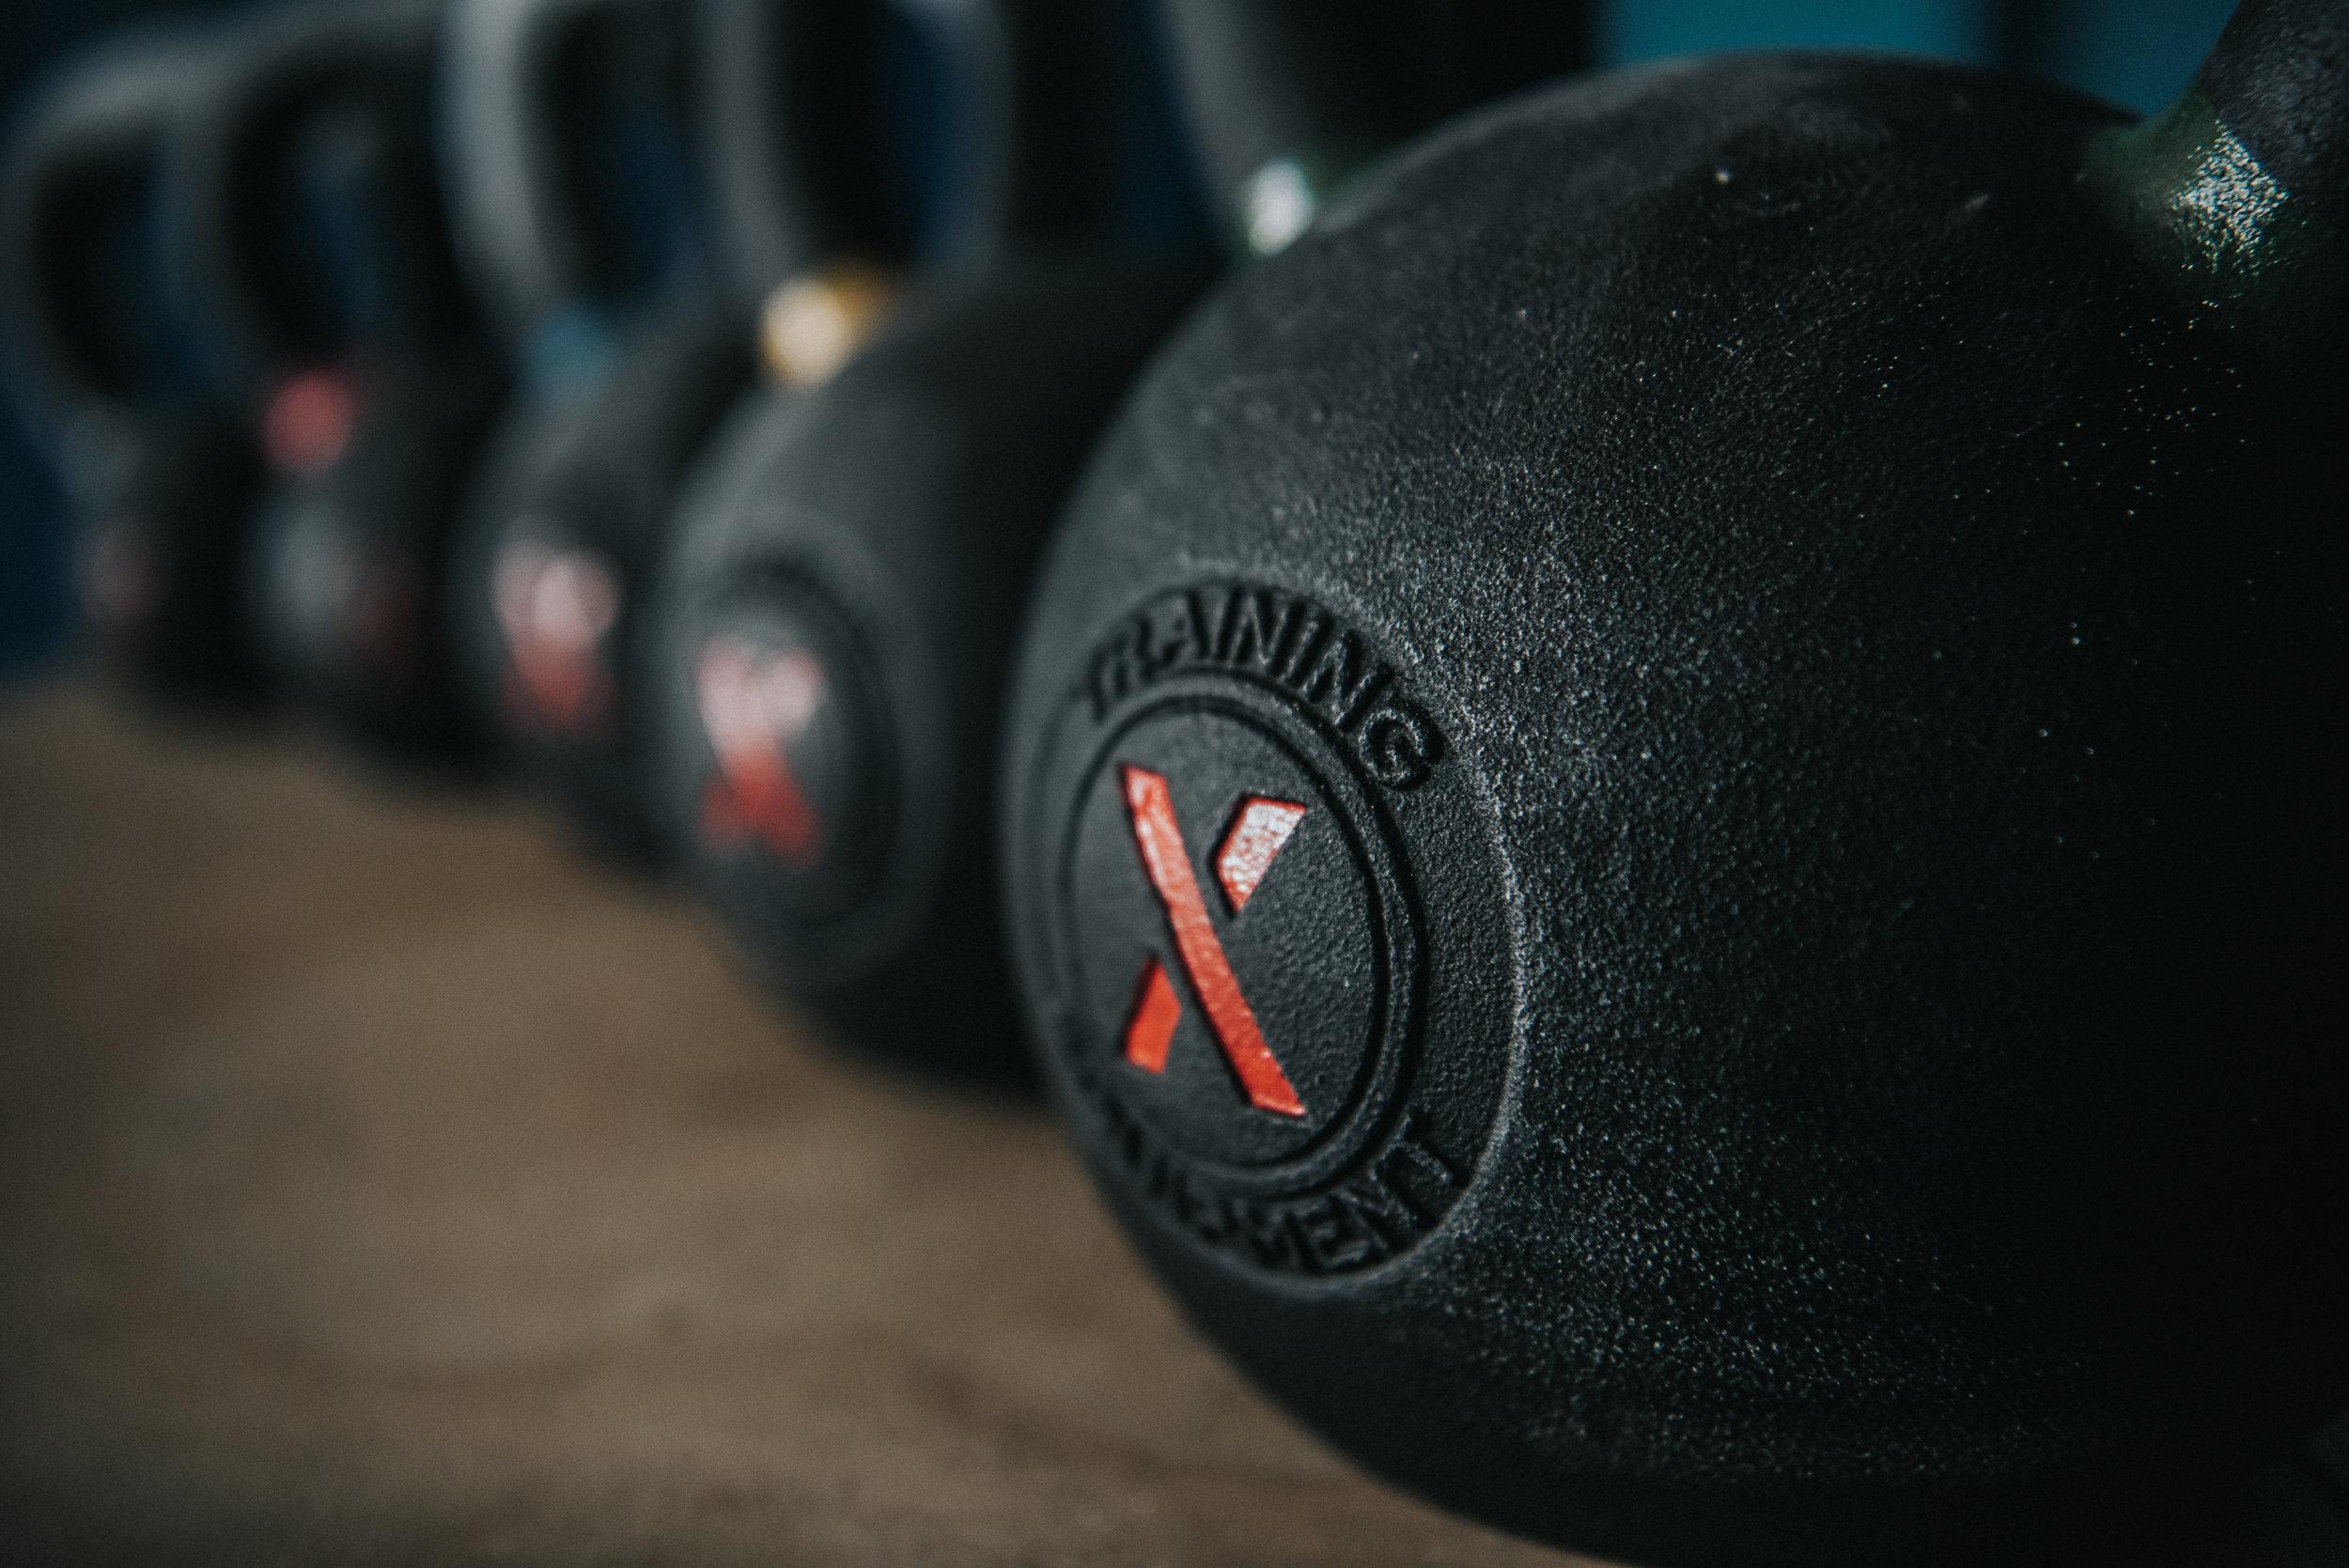 FitnessRevolutionIowaBranding-61.jpg